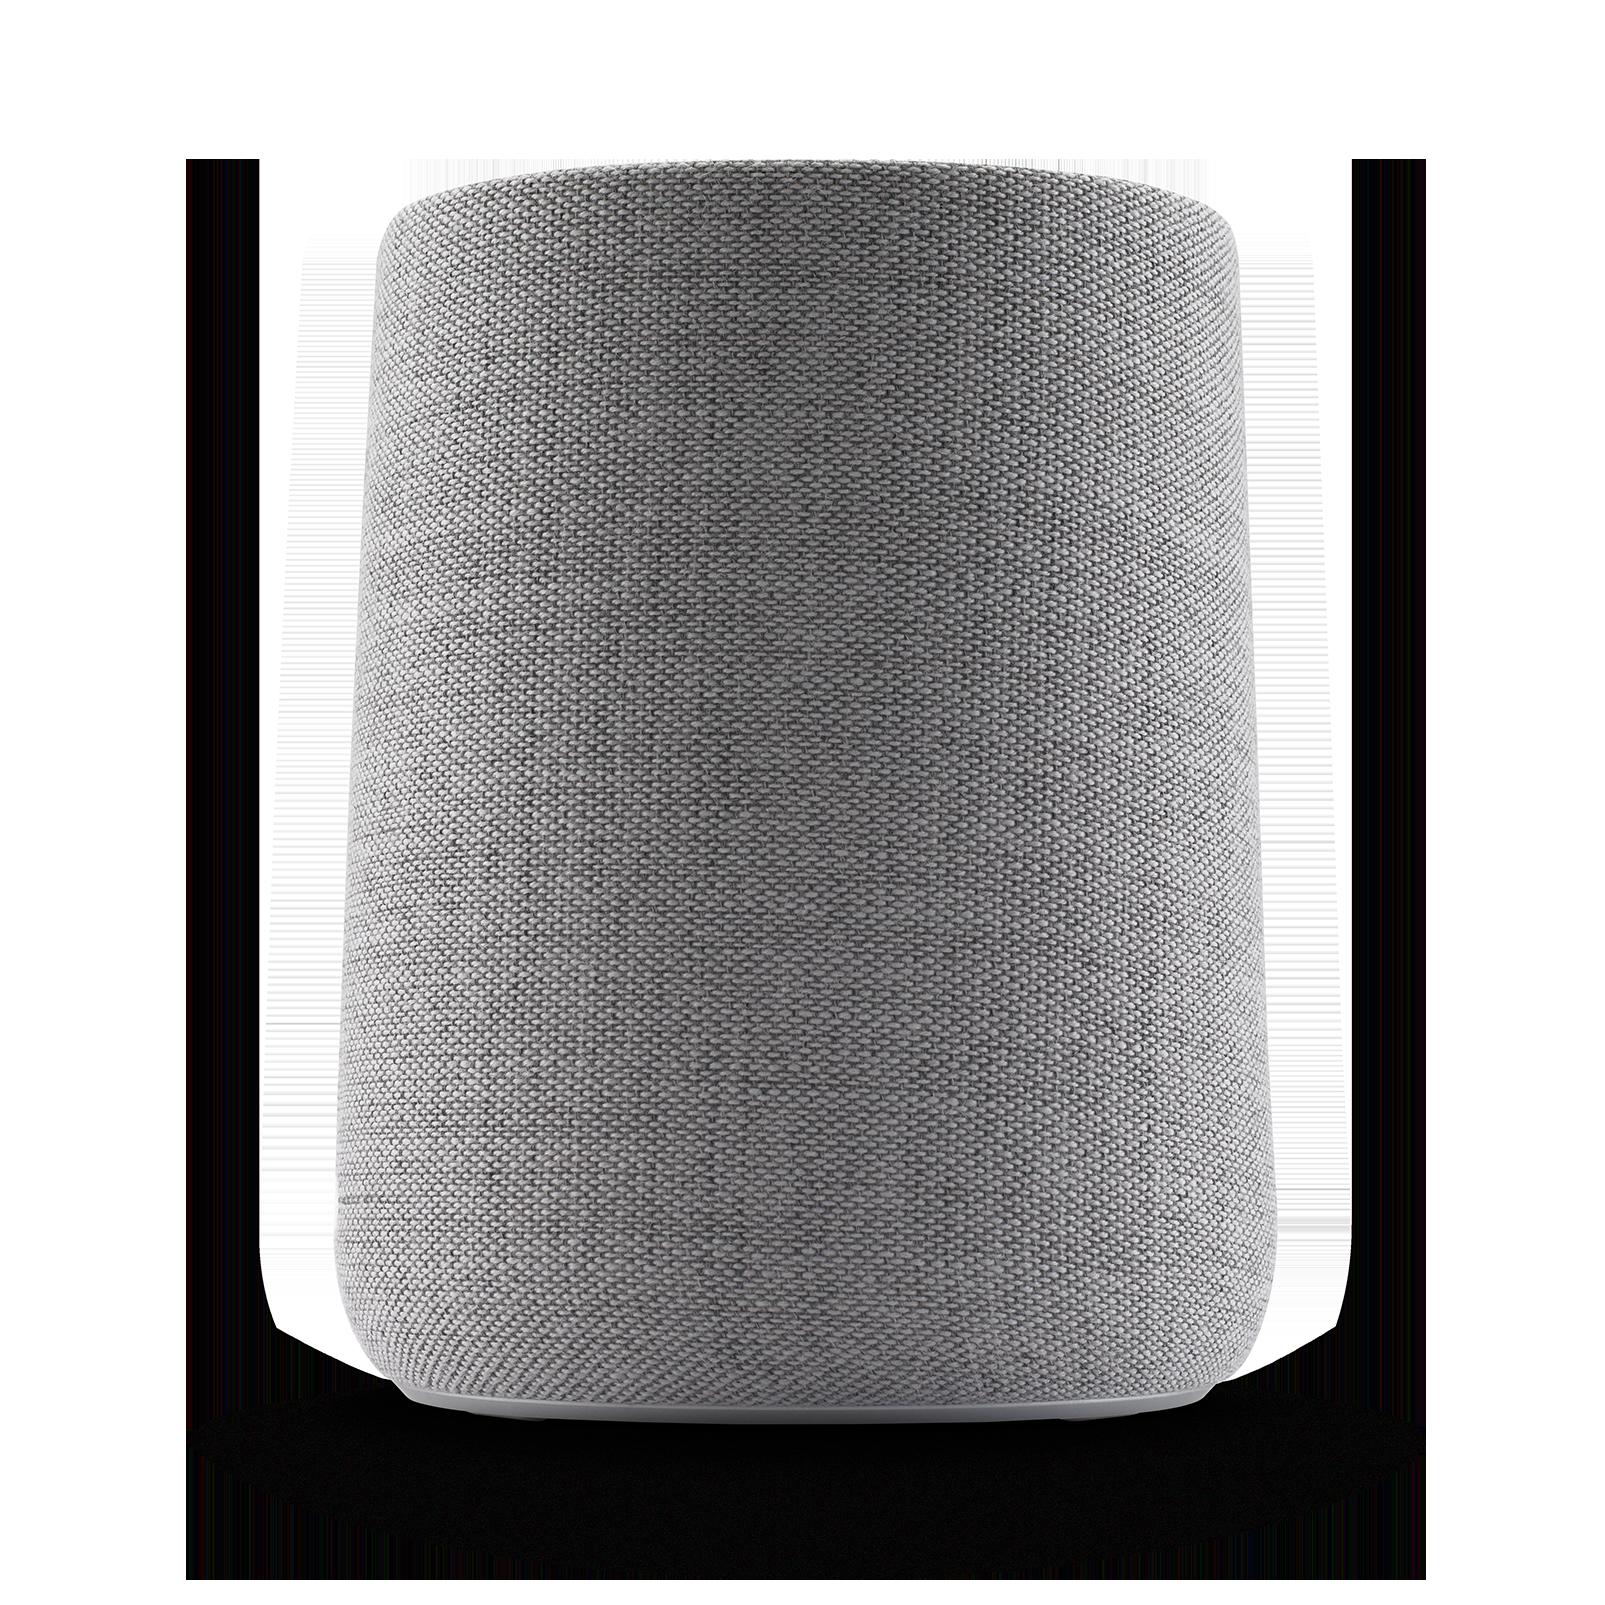 Harman Kardon Citation One MKII - Grey - All-in-one smart speaker with room-filling sound - Detailshot 1